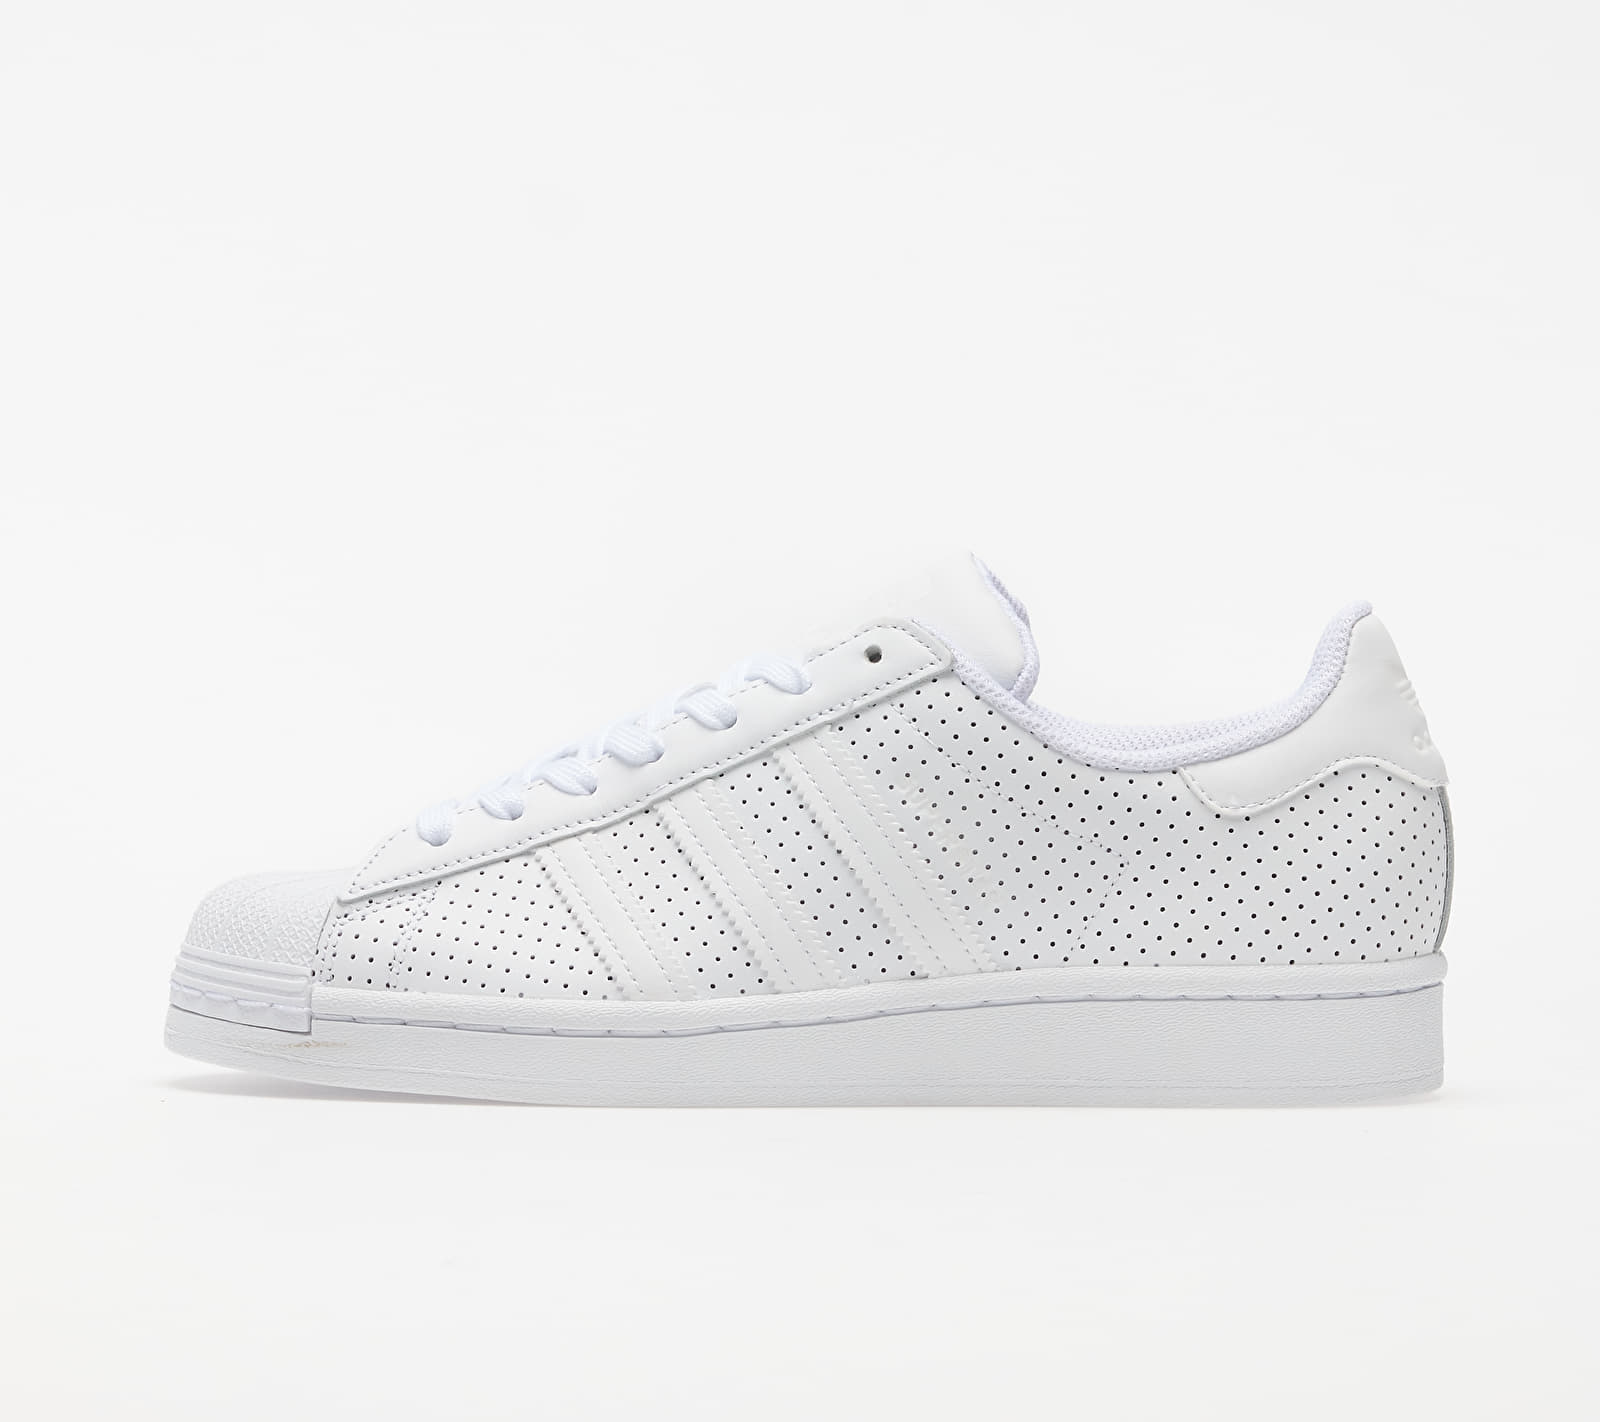 adidas Superstar W Ftw White/ Ftw White/ Ftw White EUR 36 2/3